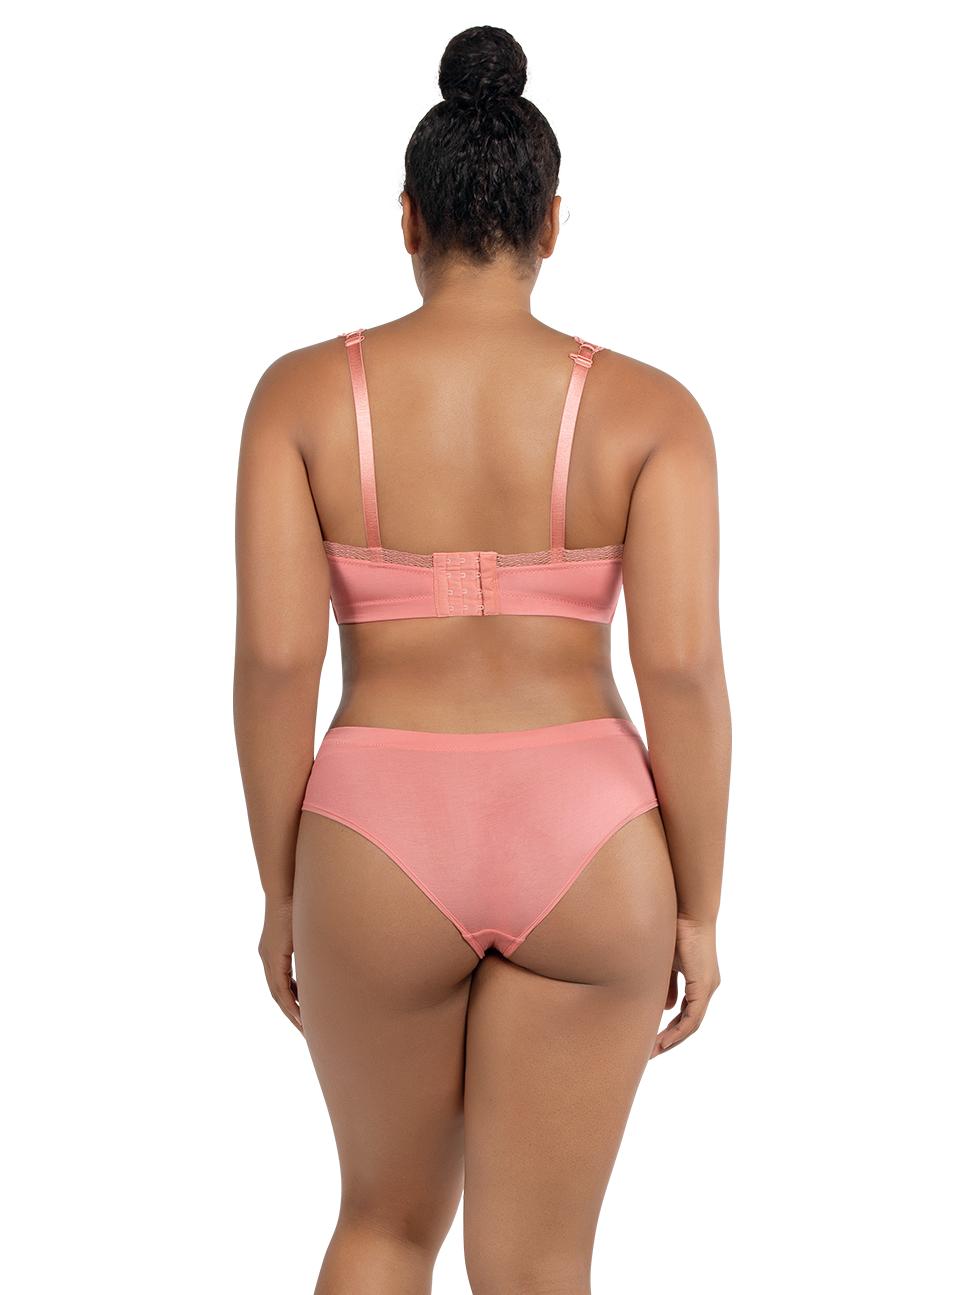 PARFAIT Dalis BraletteP5641 HipsterP5645 PinkBlush Back - Dalis Bralette - Pink Blush - P5641